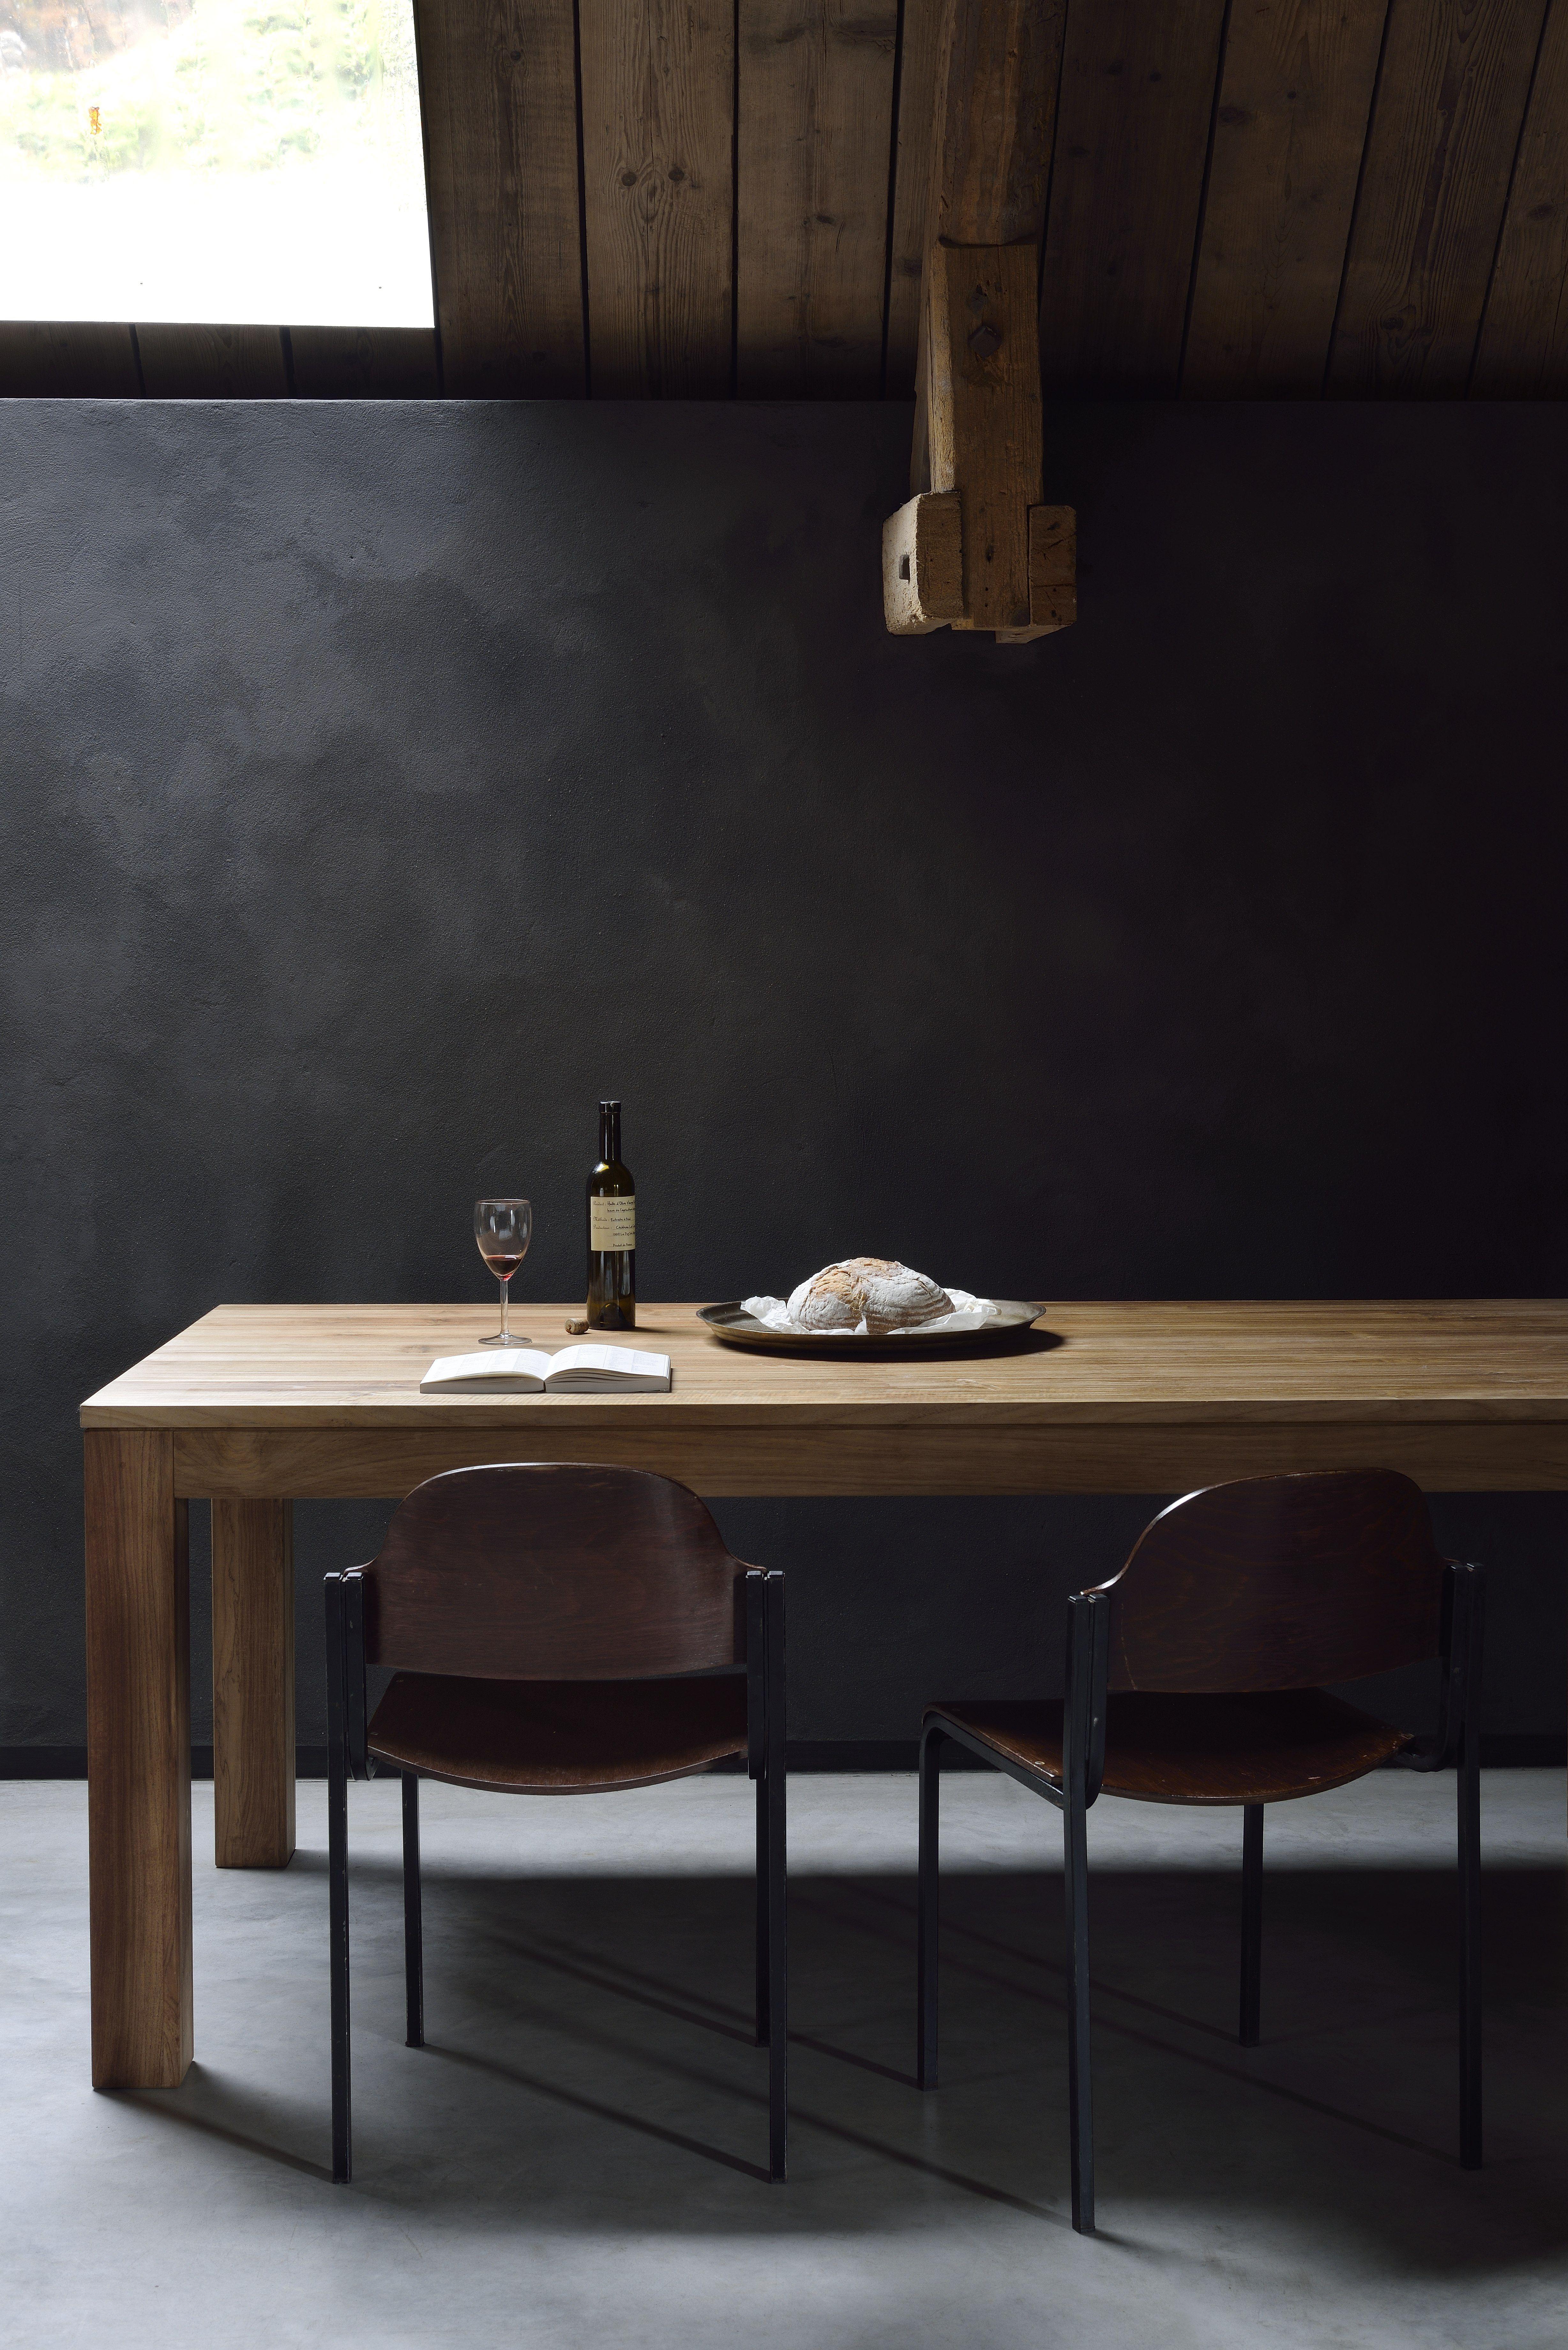 New From The Ethnicraft 2017 Novelties The Kubus Table Ethnicraft Solidwood Interiordesign Designfurniture Design Interio Mesas Decoracion De Unas Teca